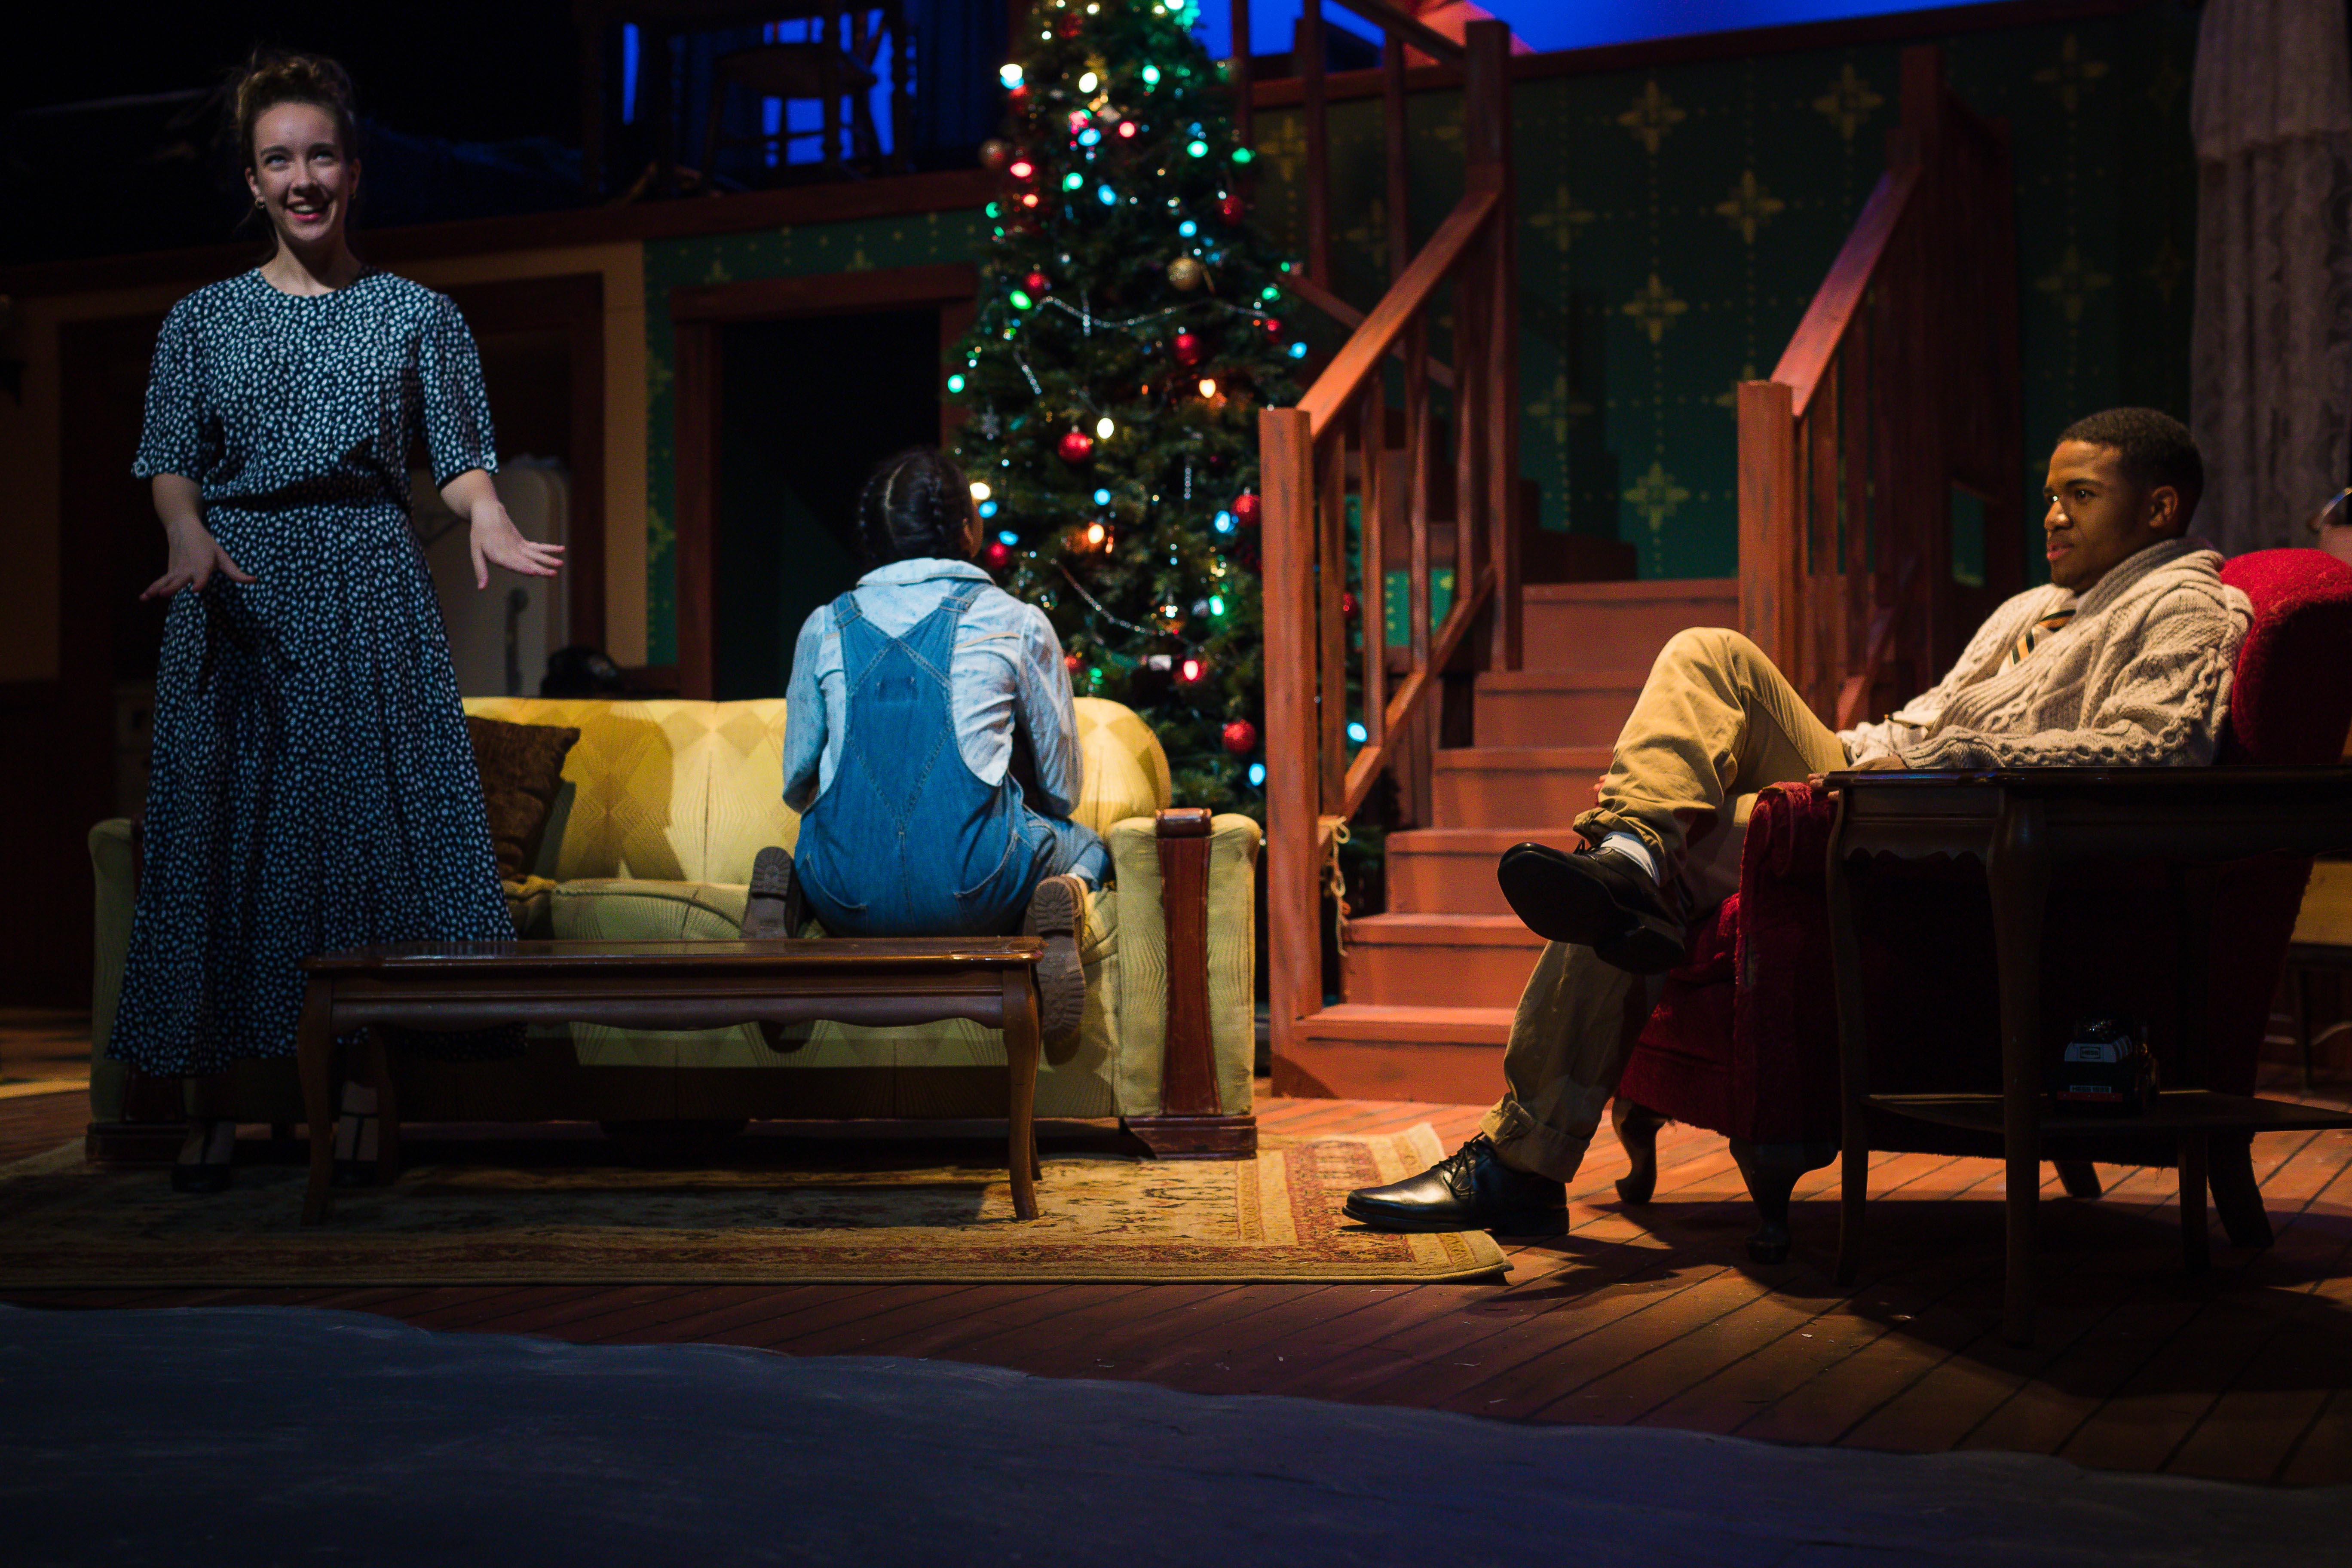 Weaver_Christmasshoot-_MG_1469